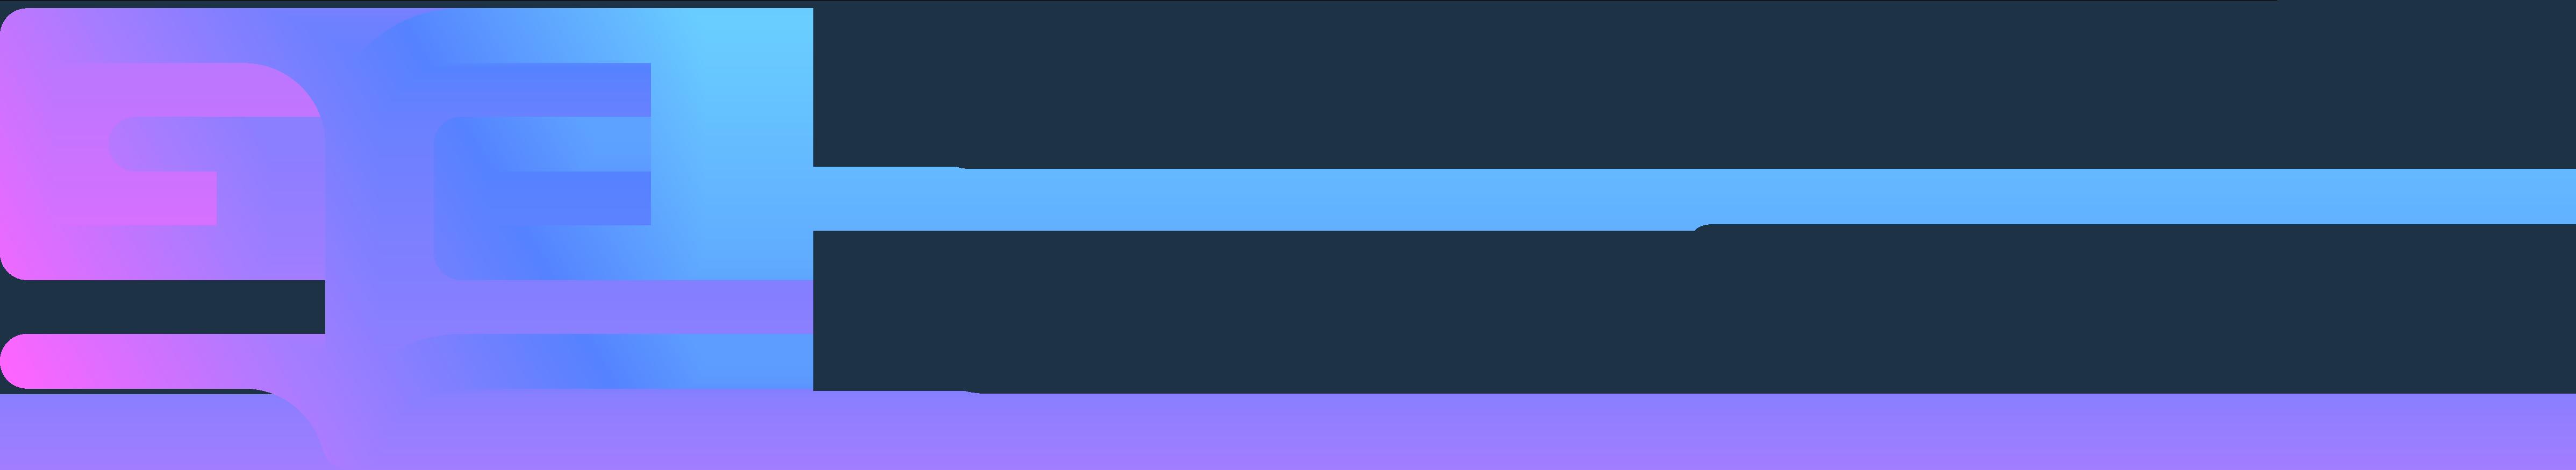 Future Education Foundation logo